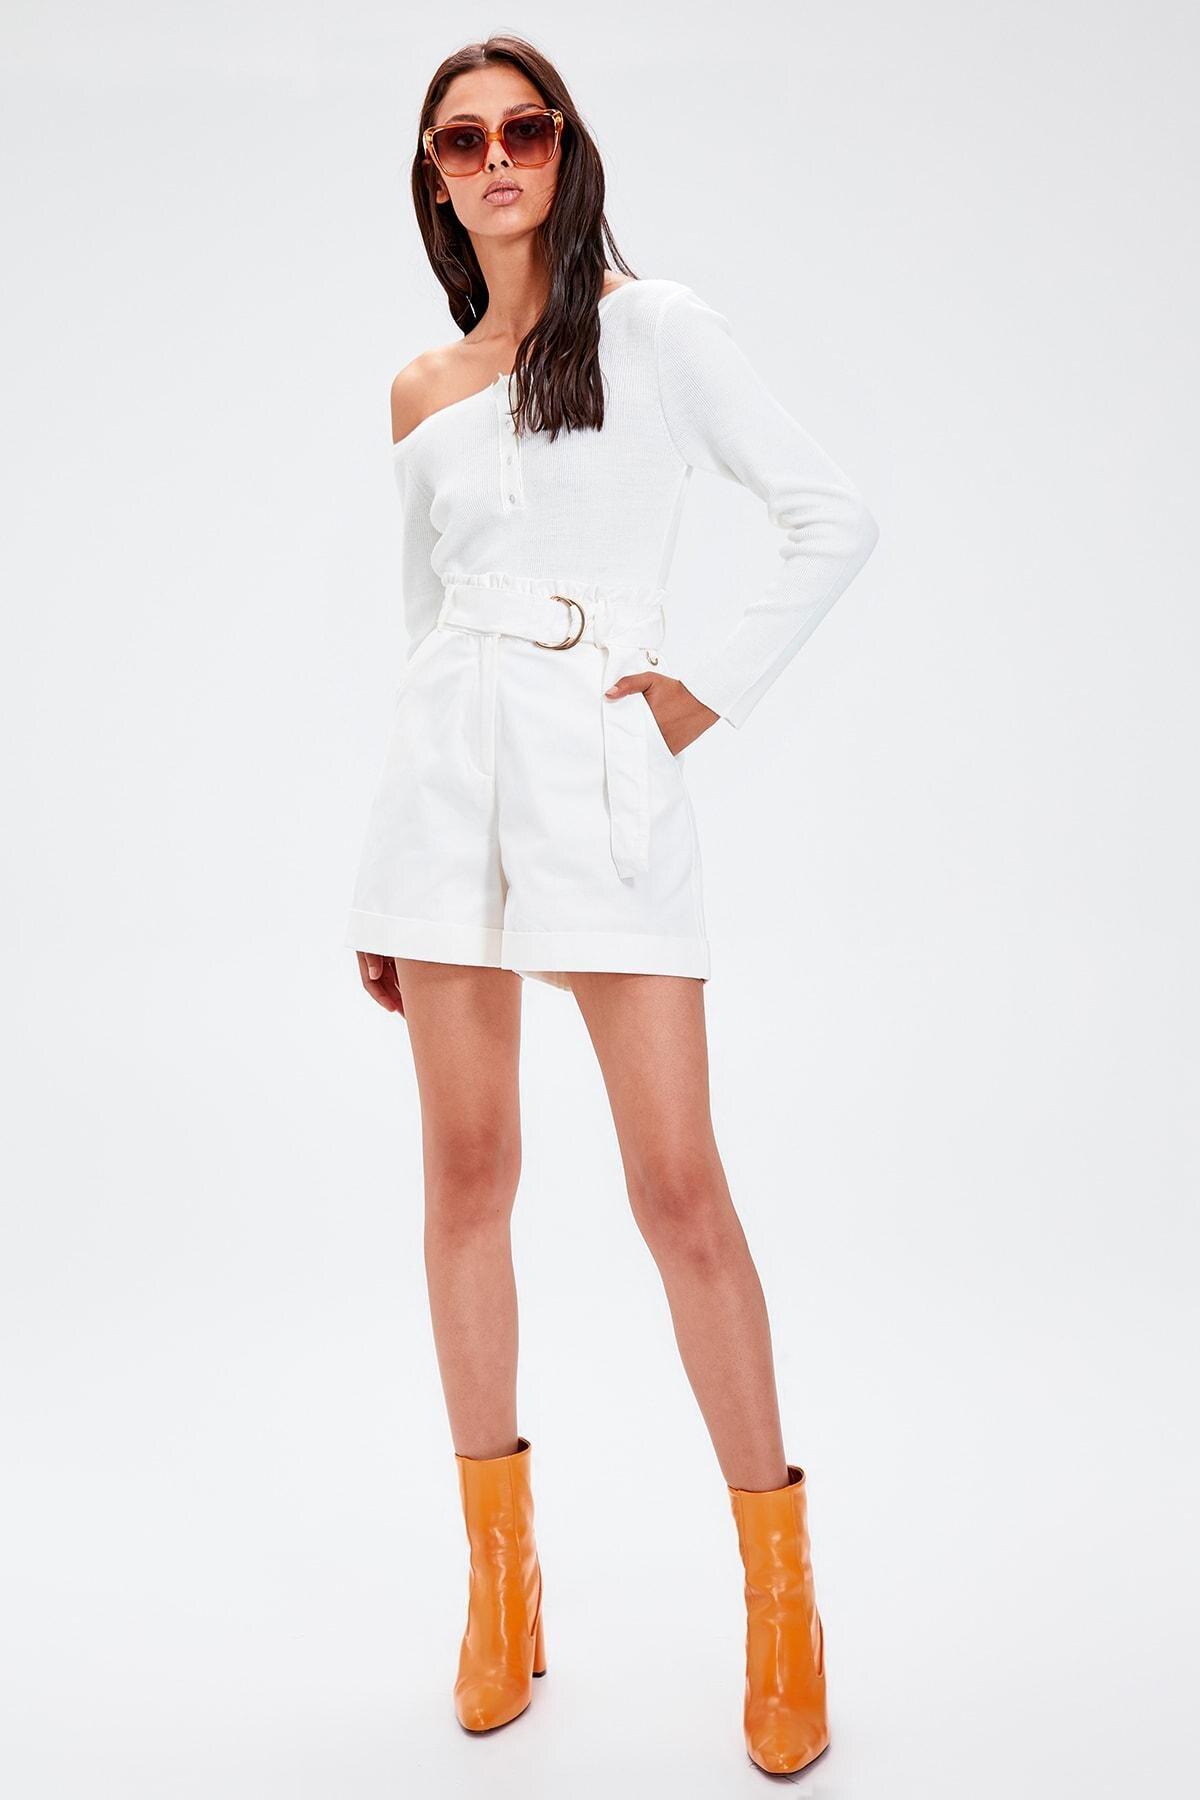 Trendyol White Arched Shorts TWOAW20SR0025